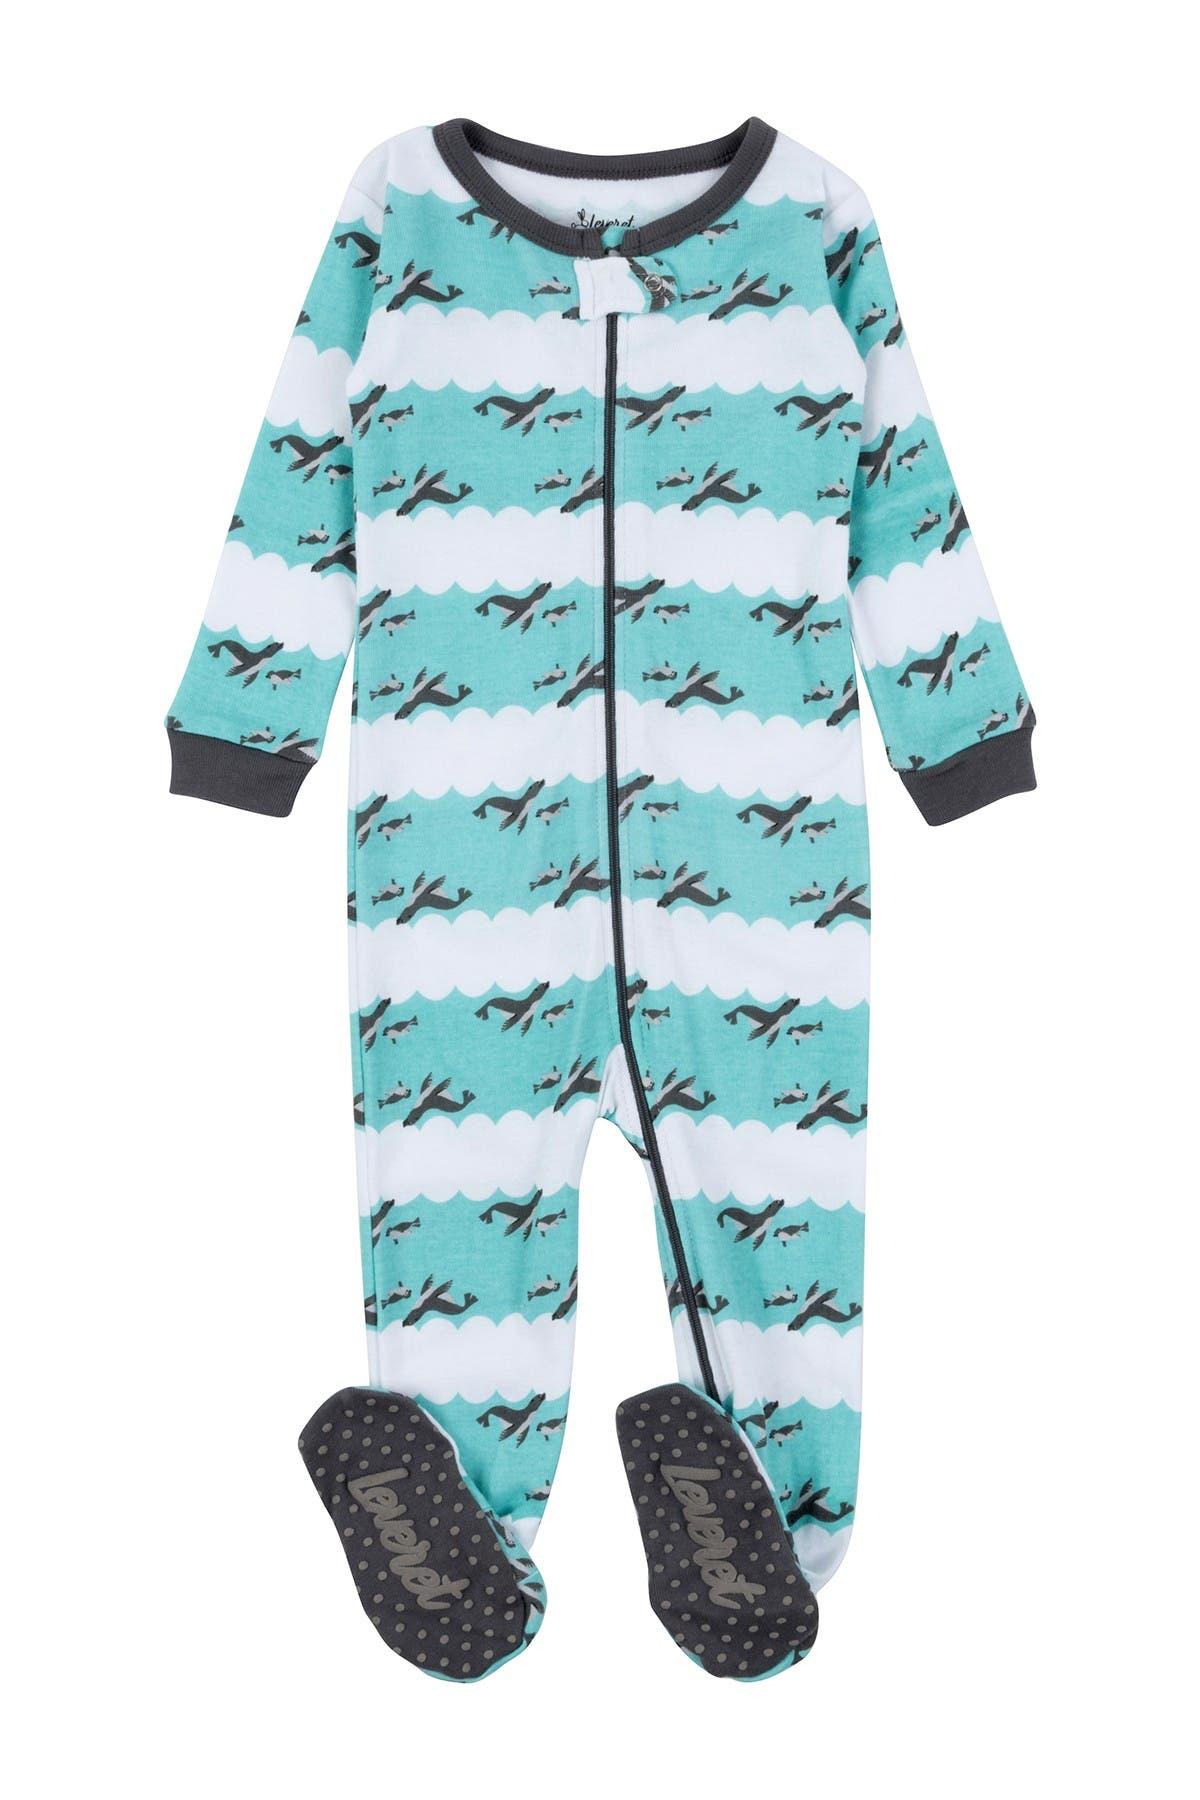 Image of Leveret Sea Lion Cotton Footie Pajama